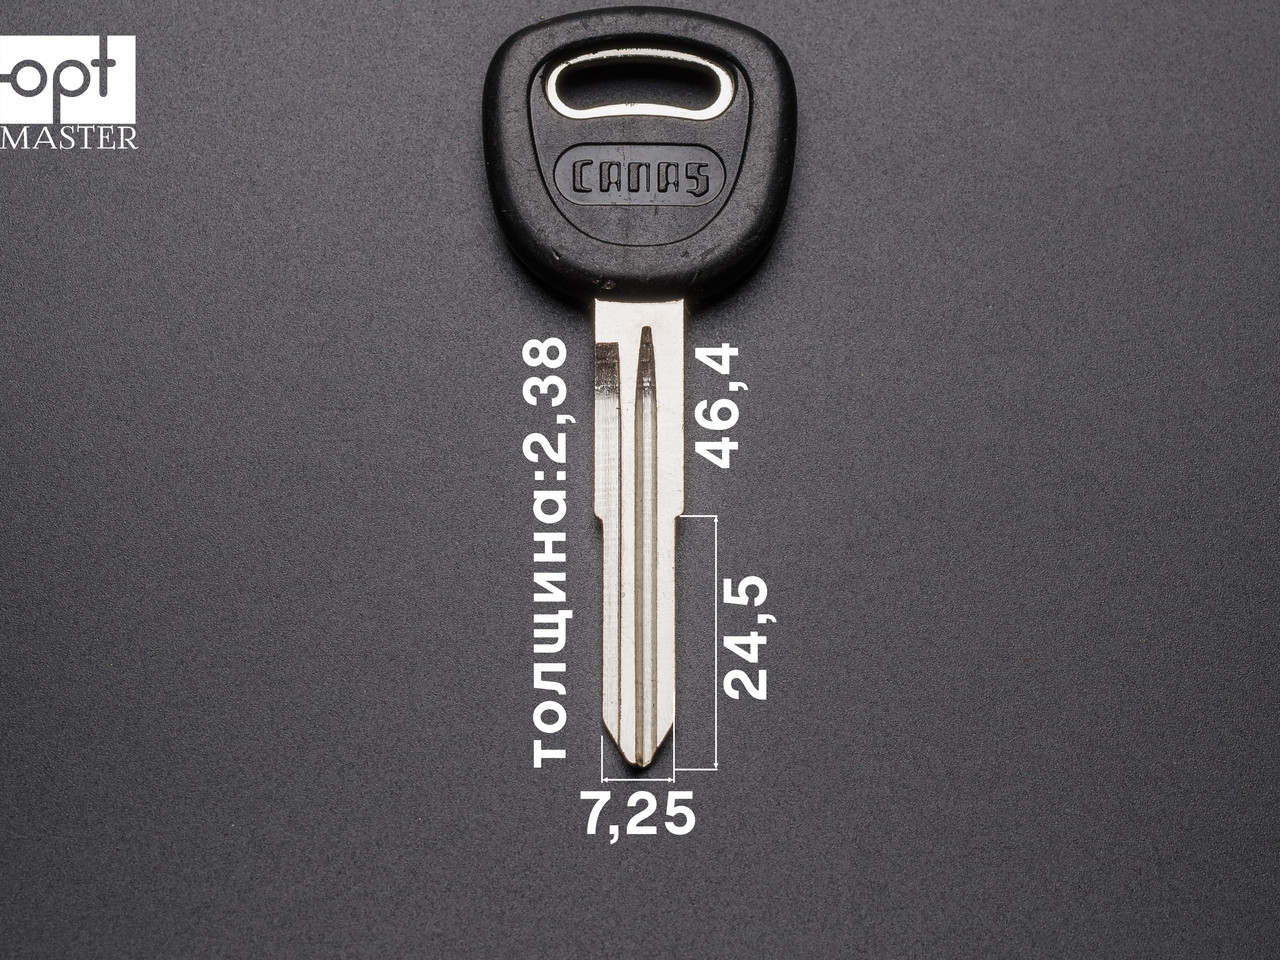 KIA - KI1DP1, арт. G-017 заготовка ключа